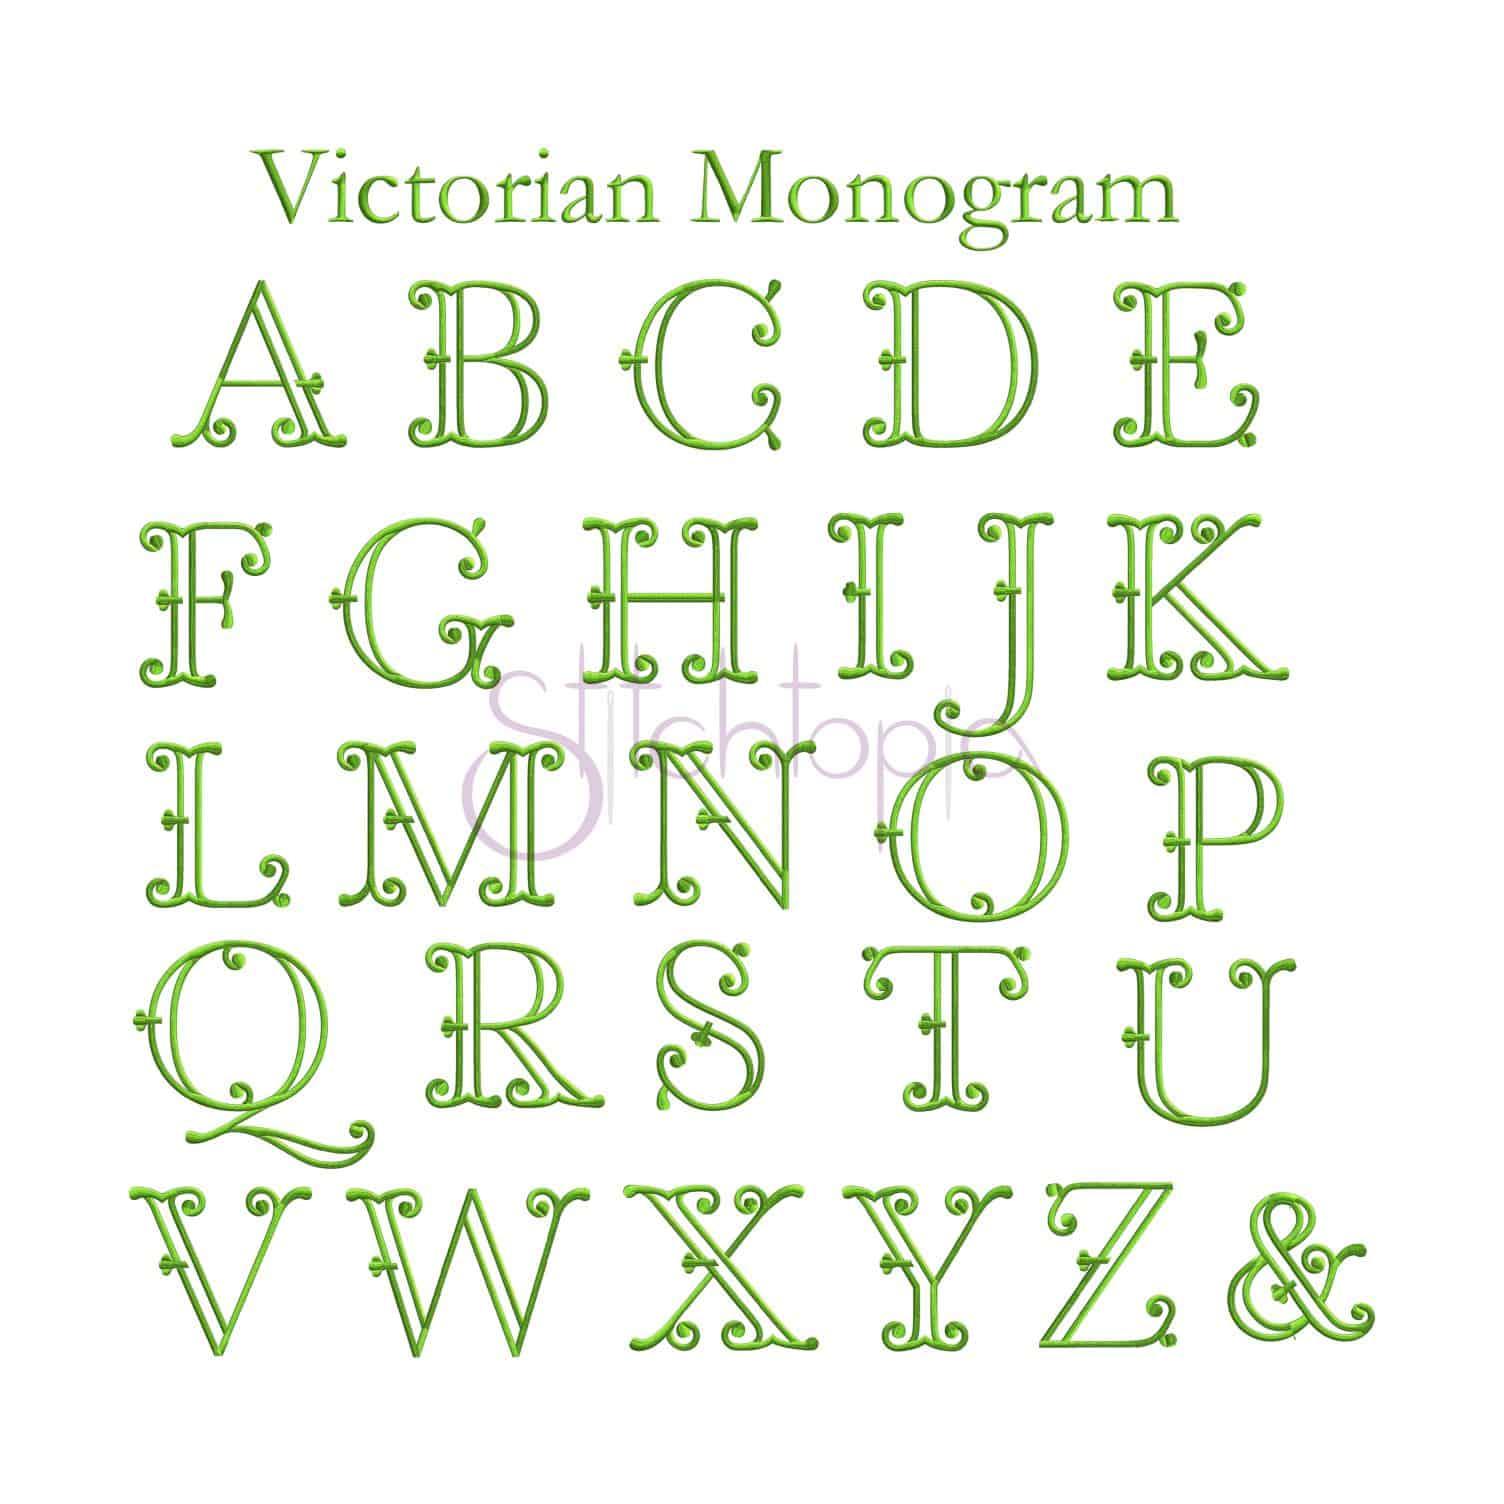 Monogram Embroidery Font Bundle - 10 Fonts